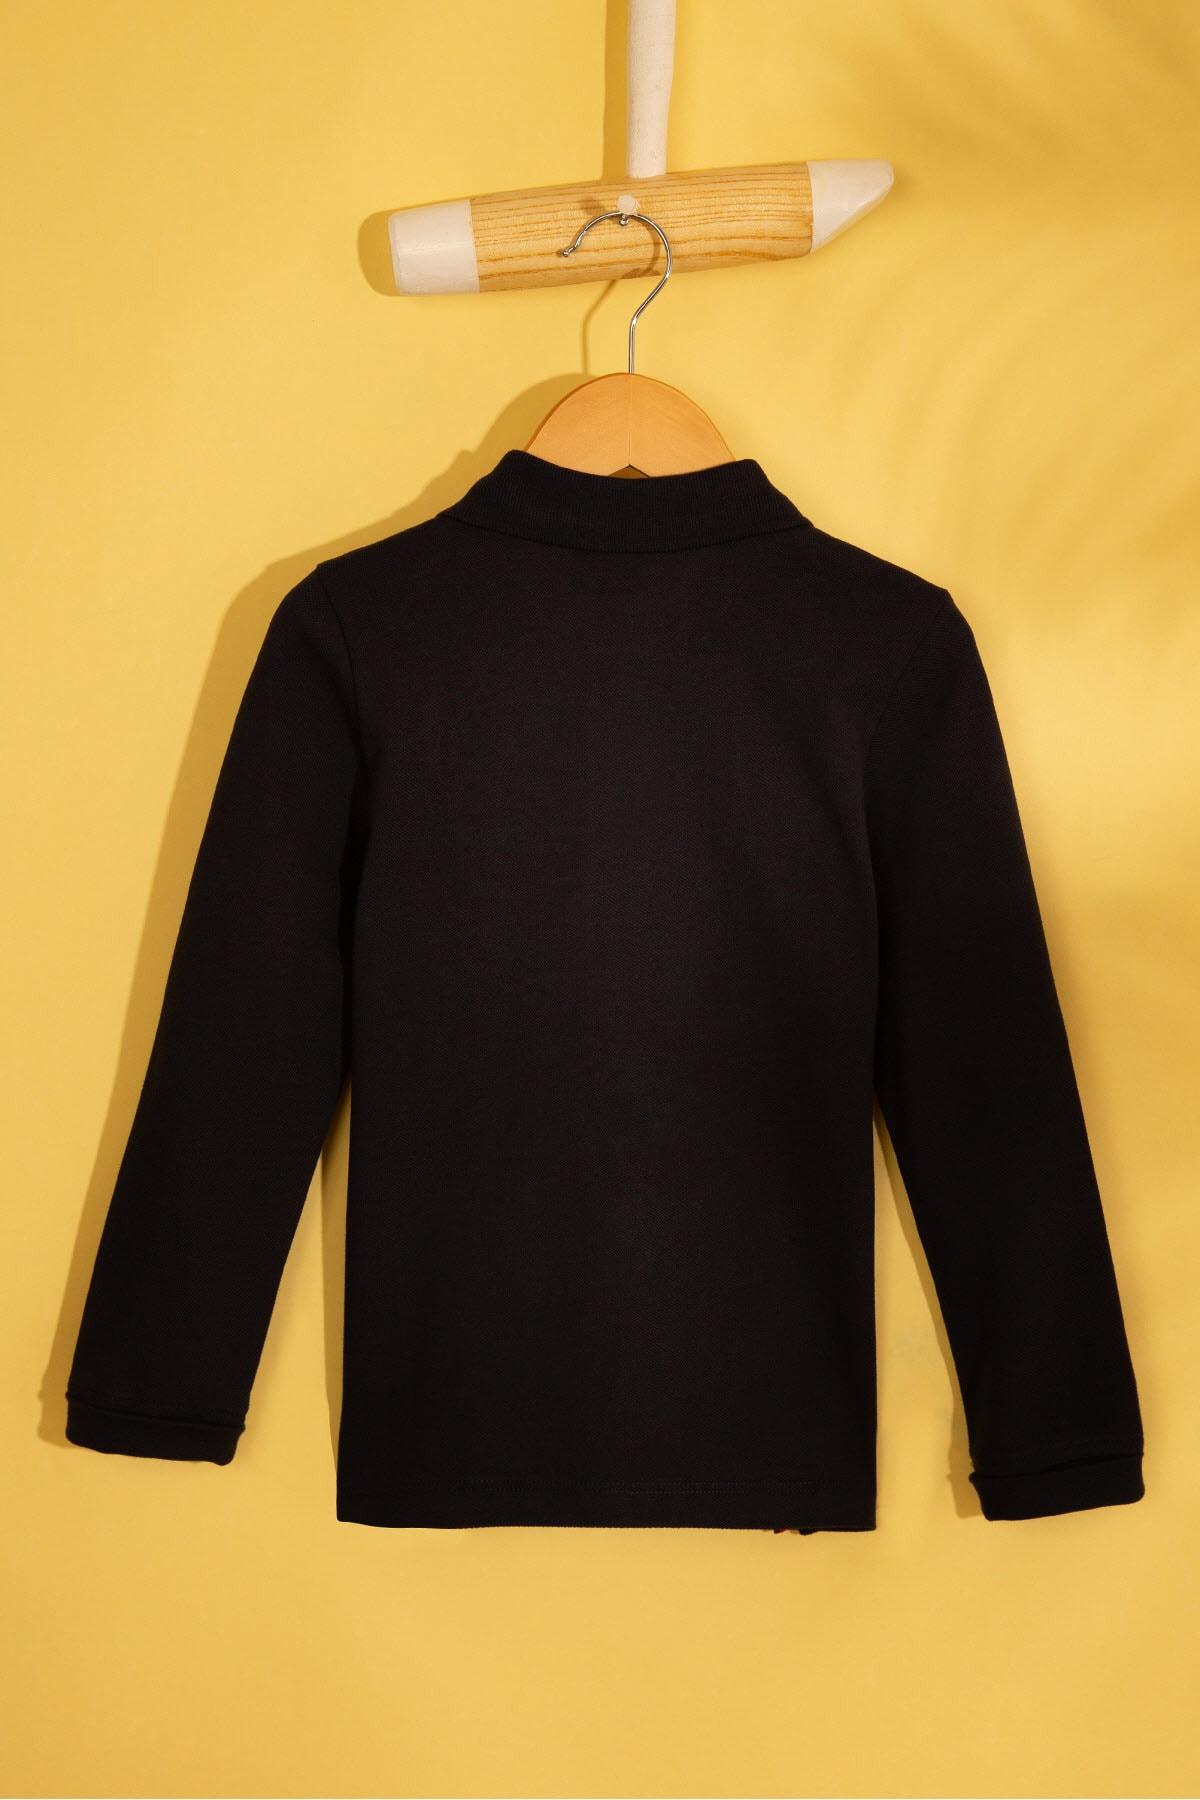 U.S. Polo Assn. Lacivert Erkek Çocuk Sweatshirt 2